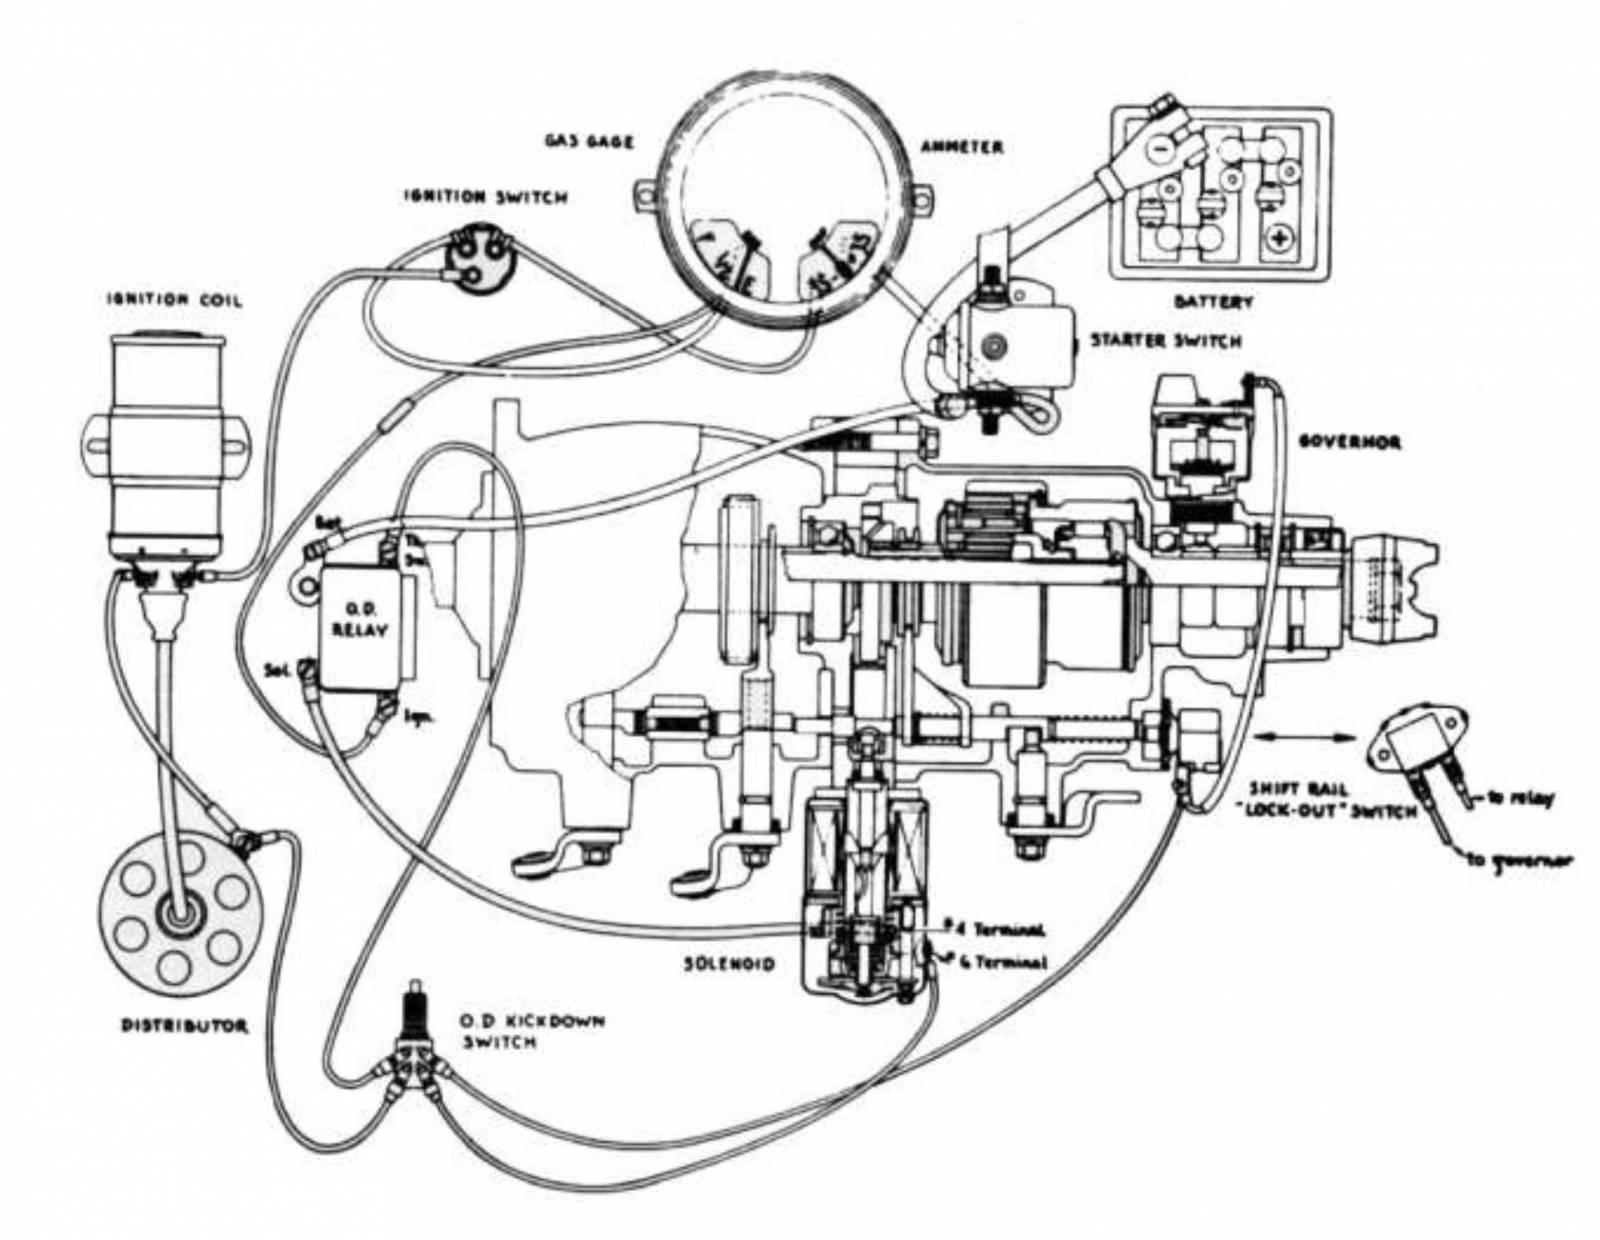 borg warner overdrive relay wiring diagram